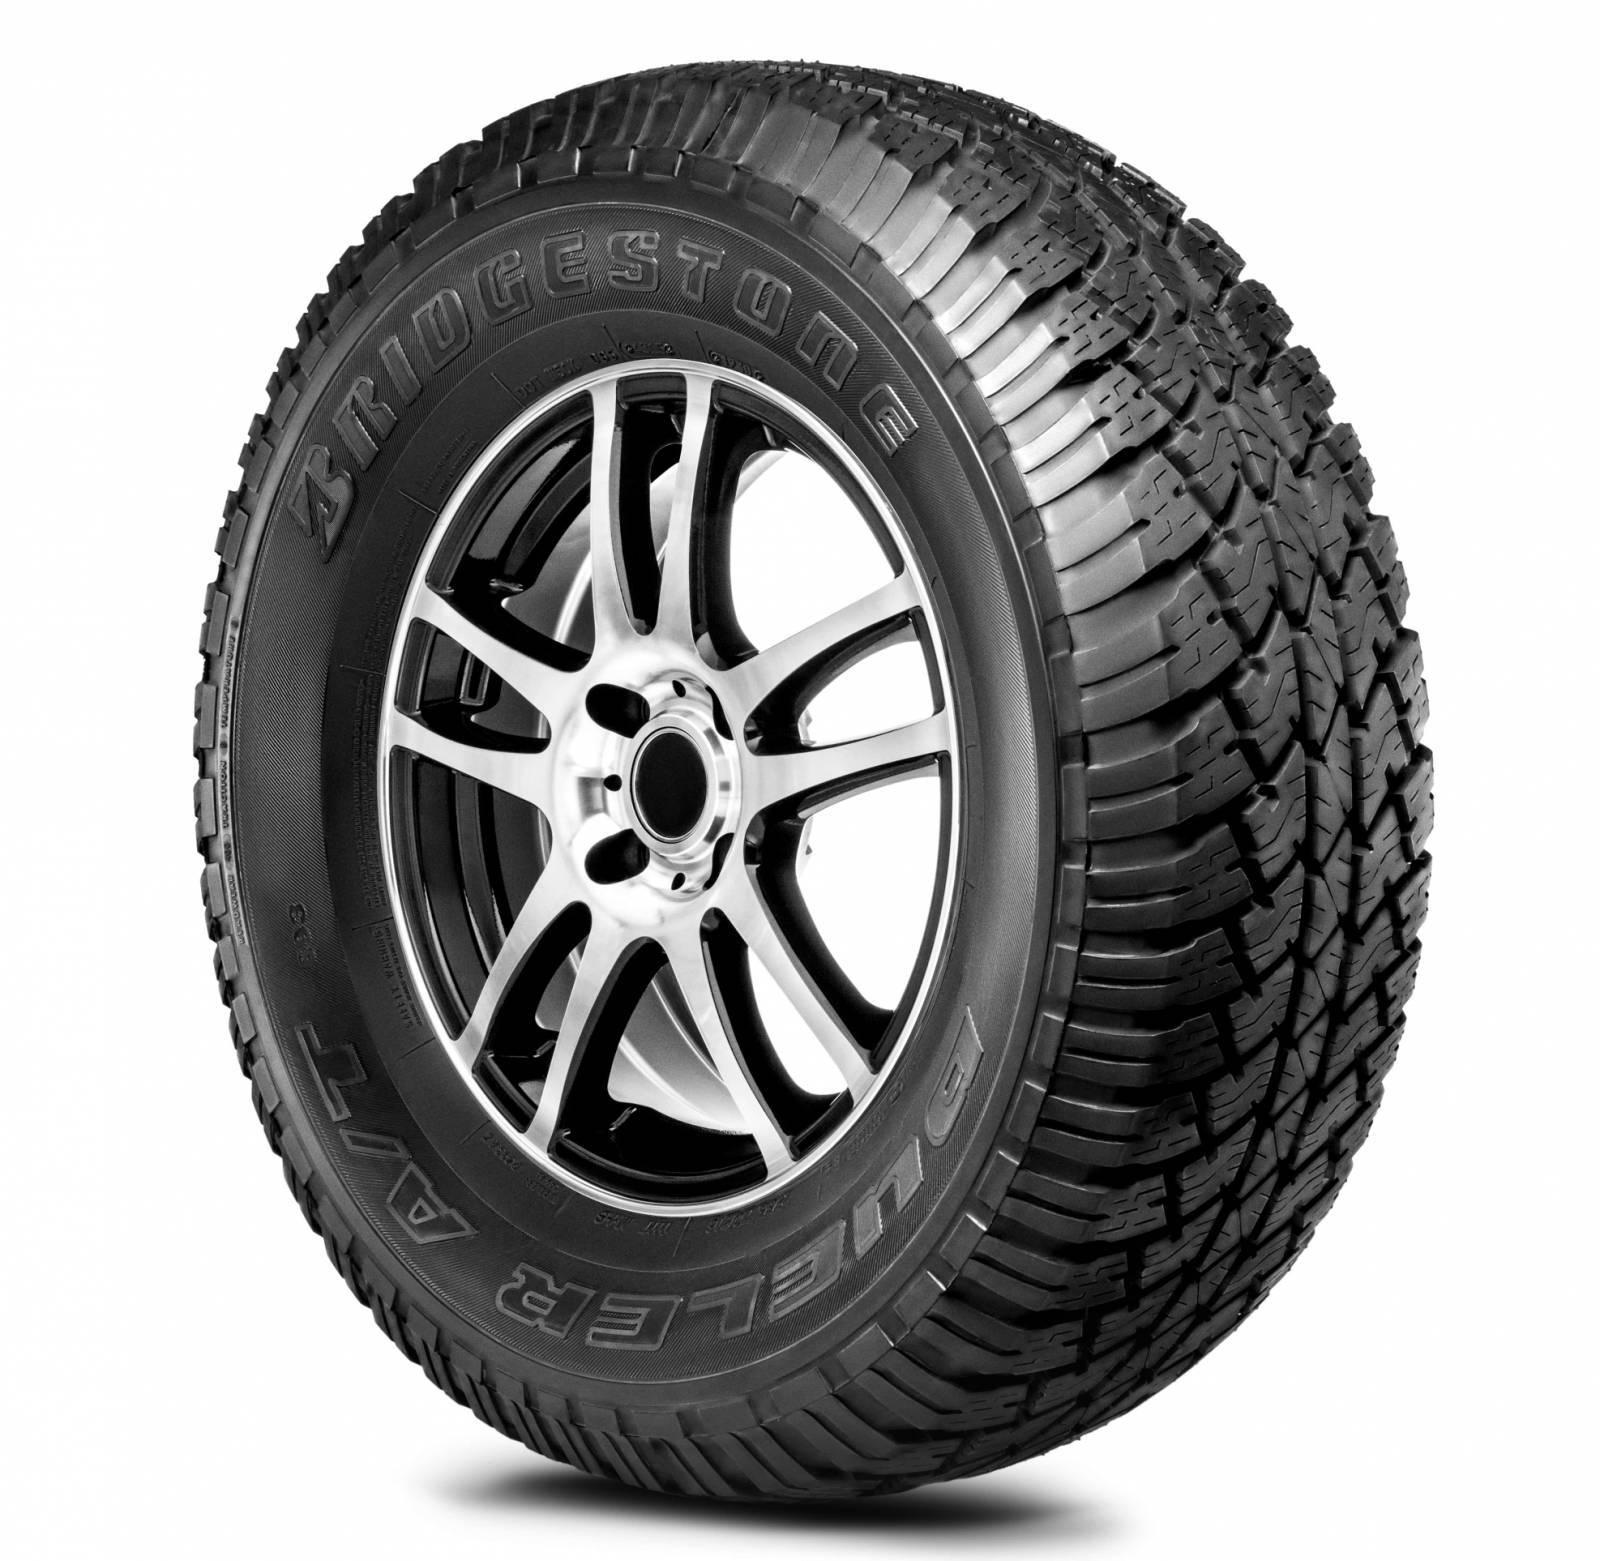 Pneu Bridgestone Dueler A/T 693 205/70 R15 96T - Cantele Centro Automotivo